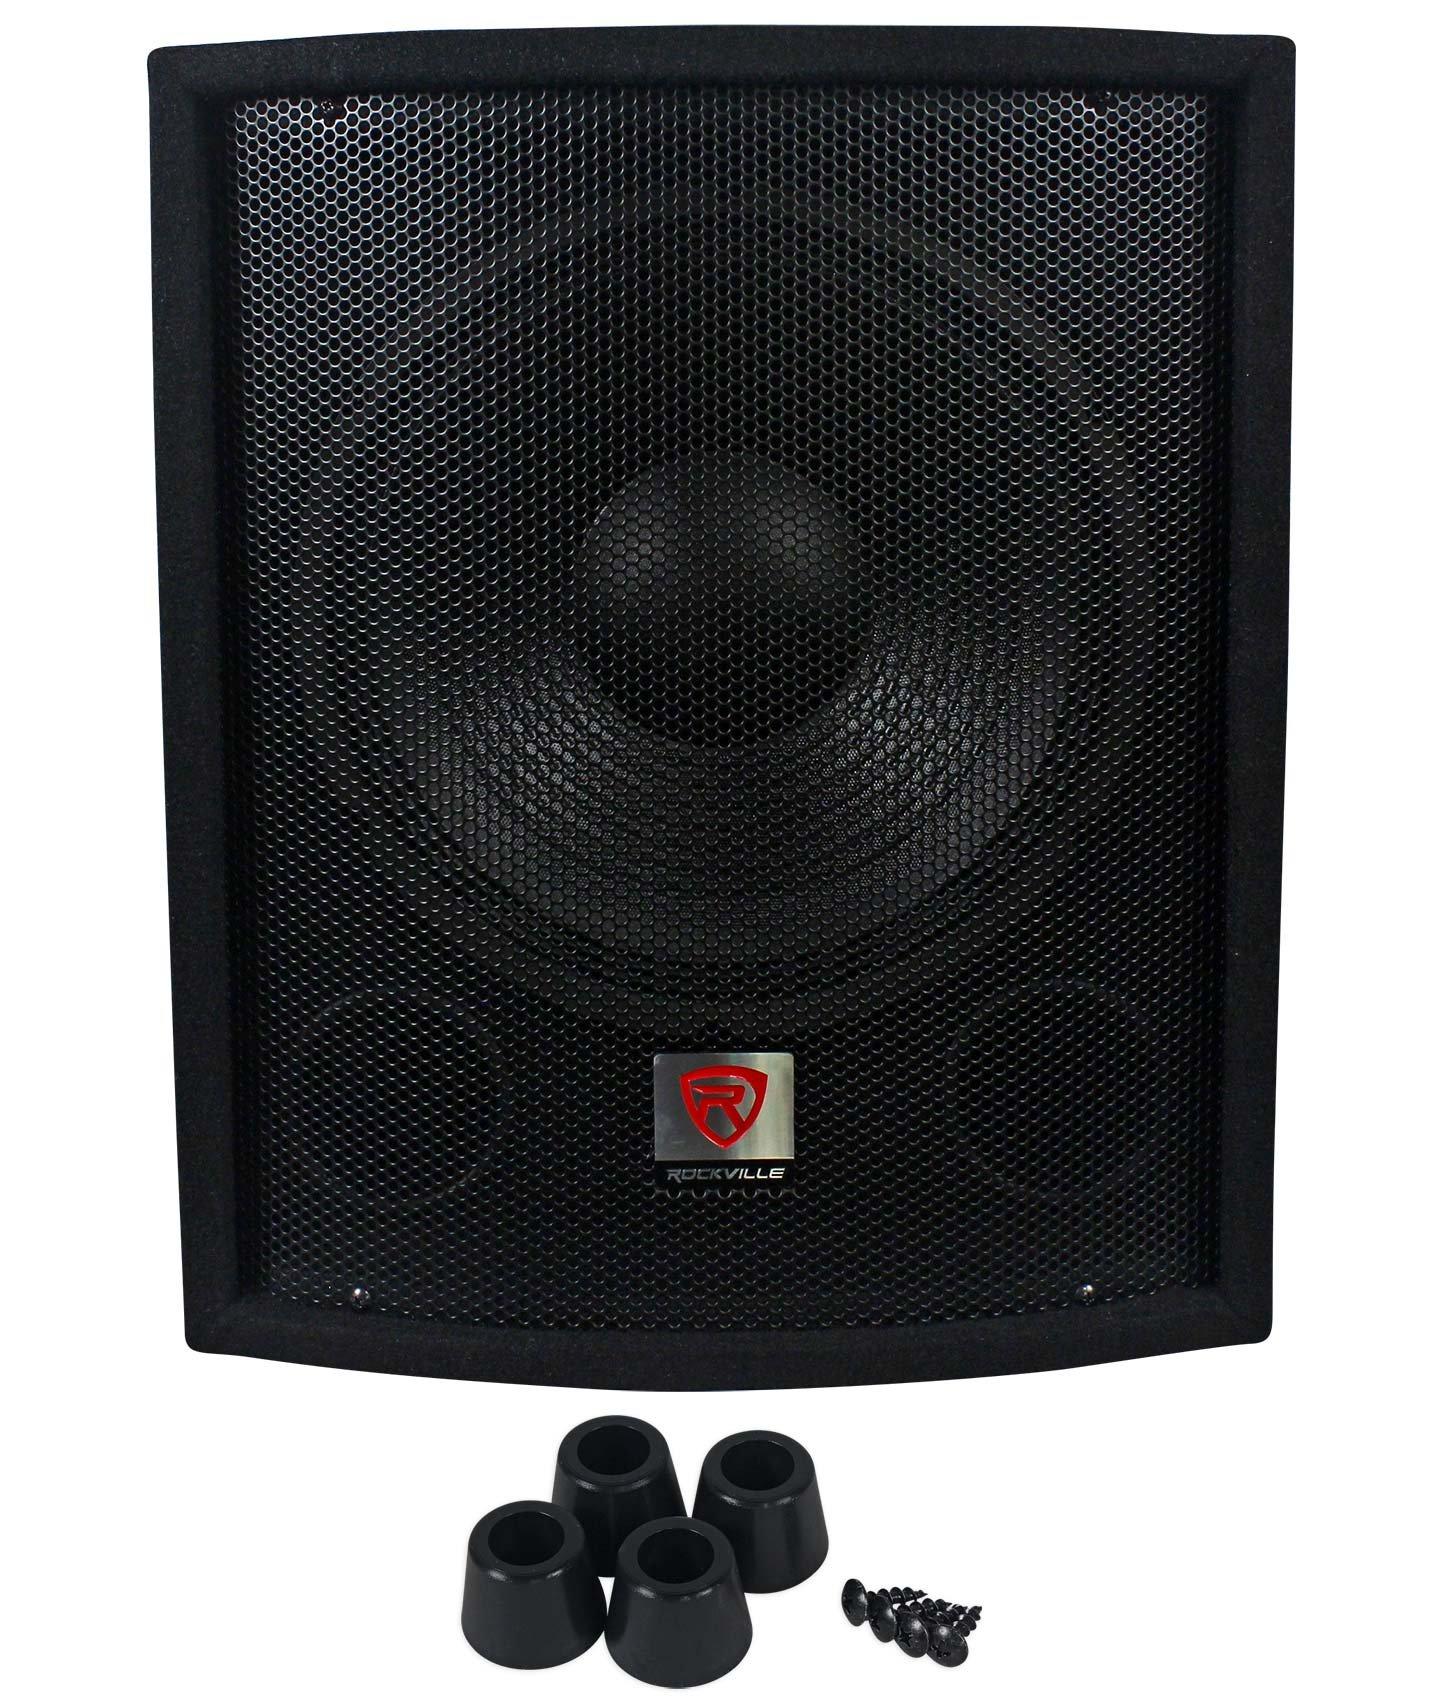 Rockville SBG1128 12'' 600 Watt Passive Pro DJ Subwoofer, MDF Cabinet/Pole Mount by Rockville (Image #2)